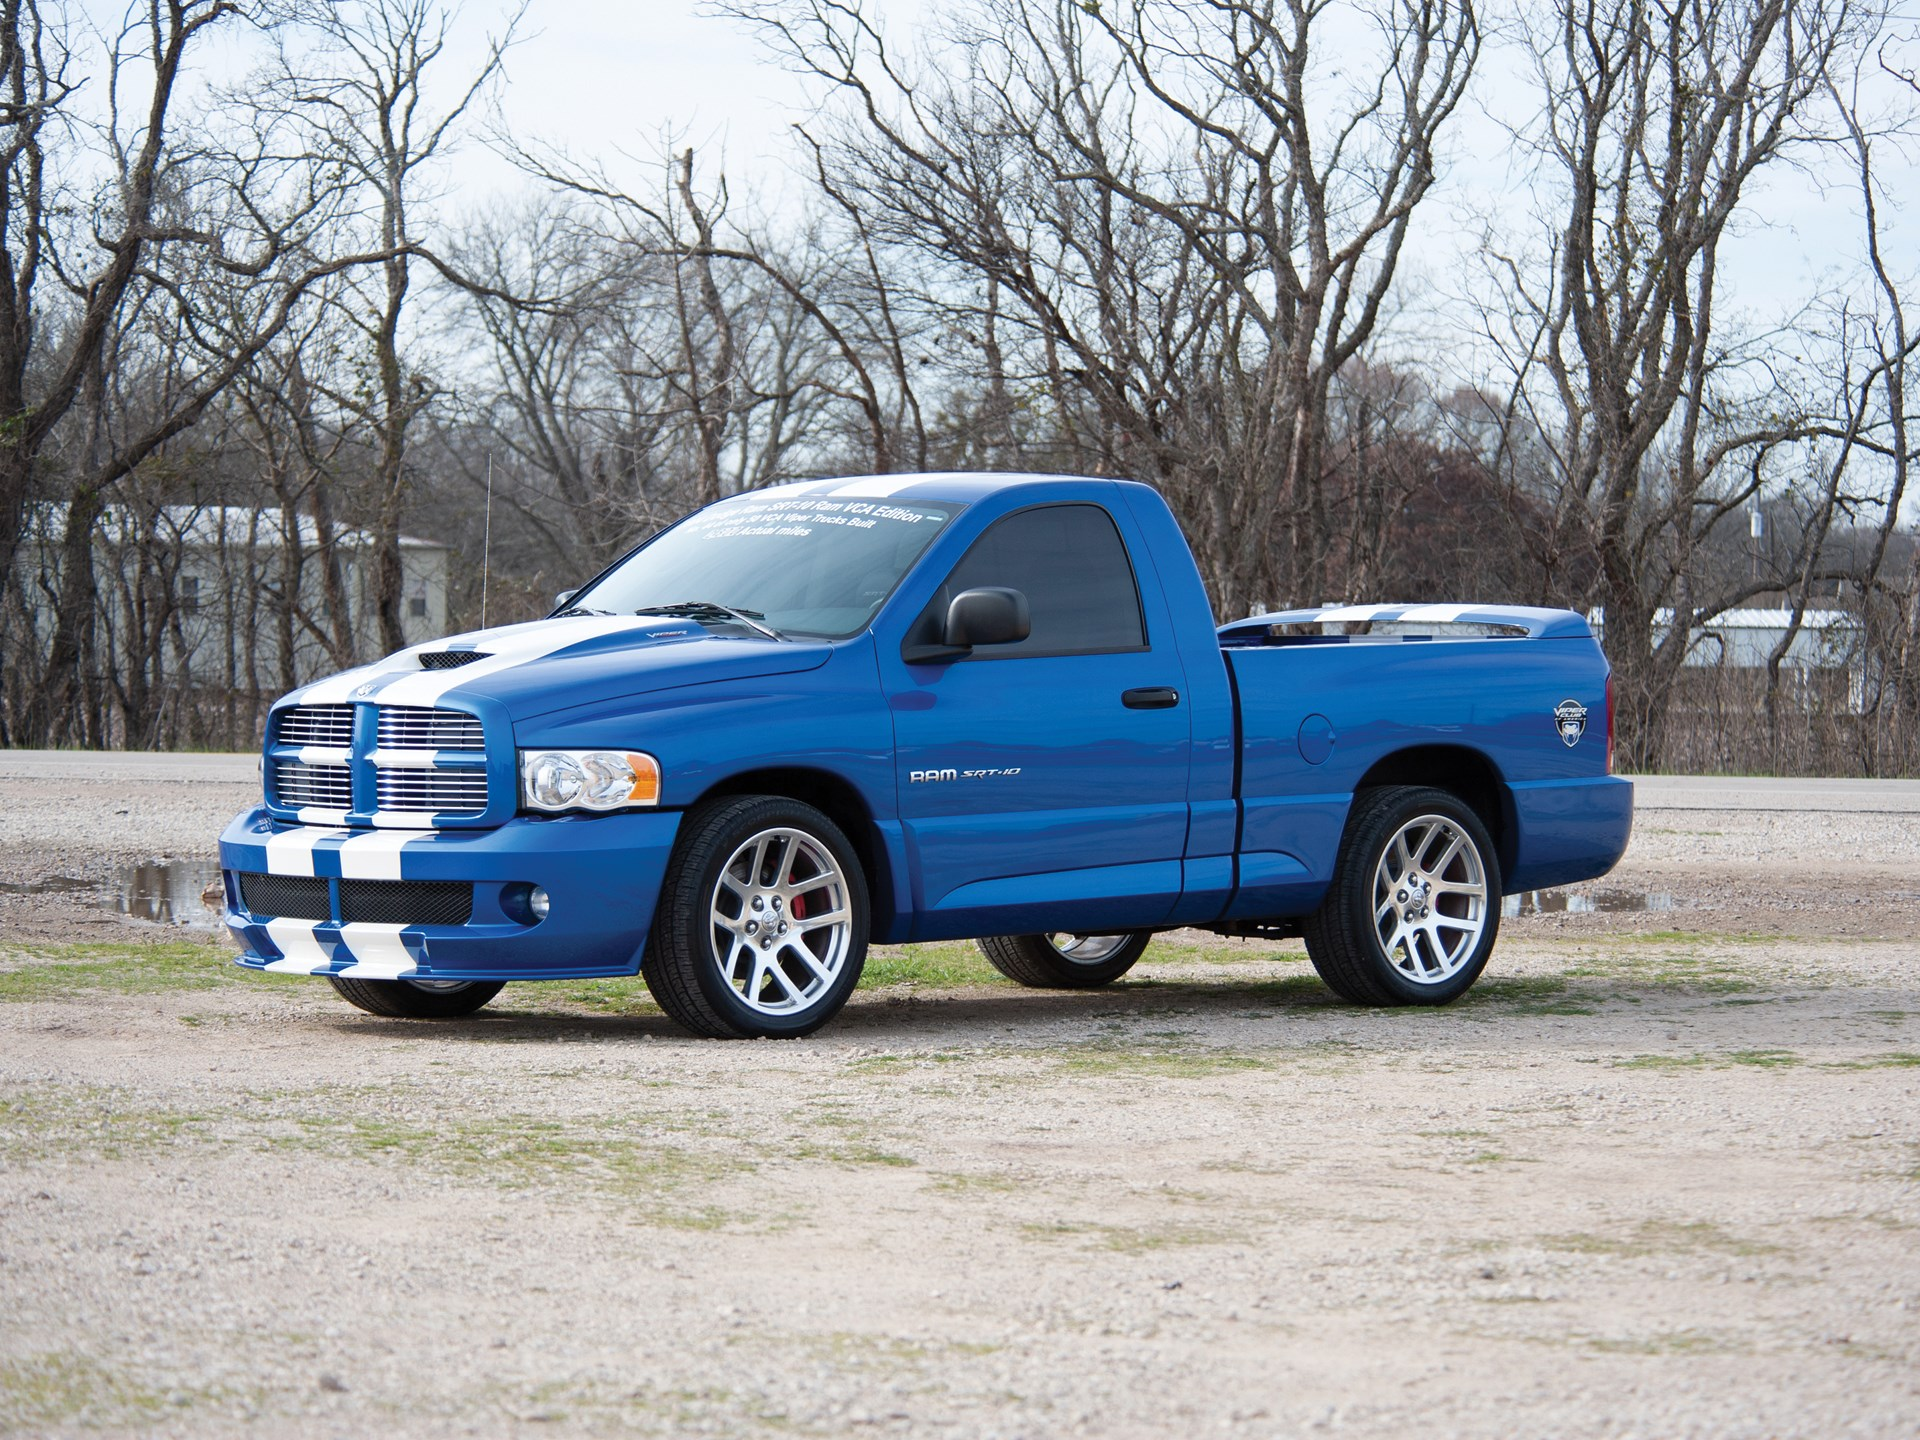 Dodge Ram Srt 10 >> Rm Sotheby S 2004 Dodge Ram Srt 10 Vca Edition Fort Lauderdale 2019